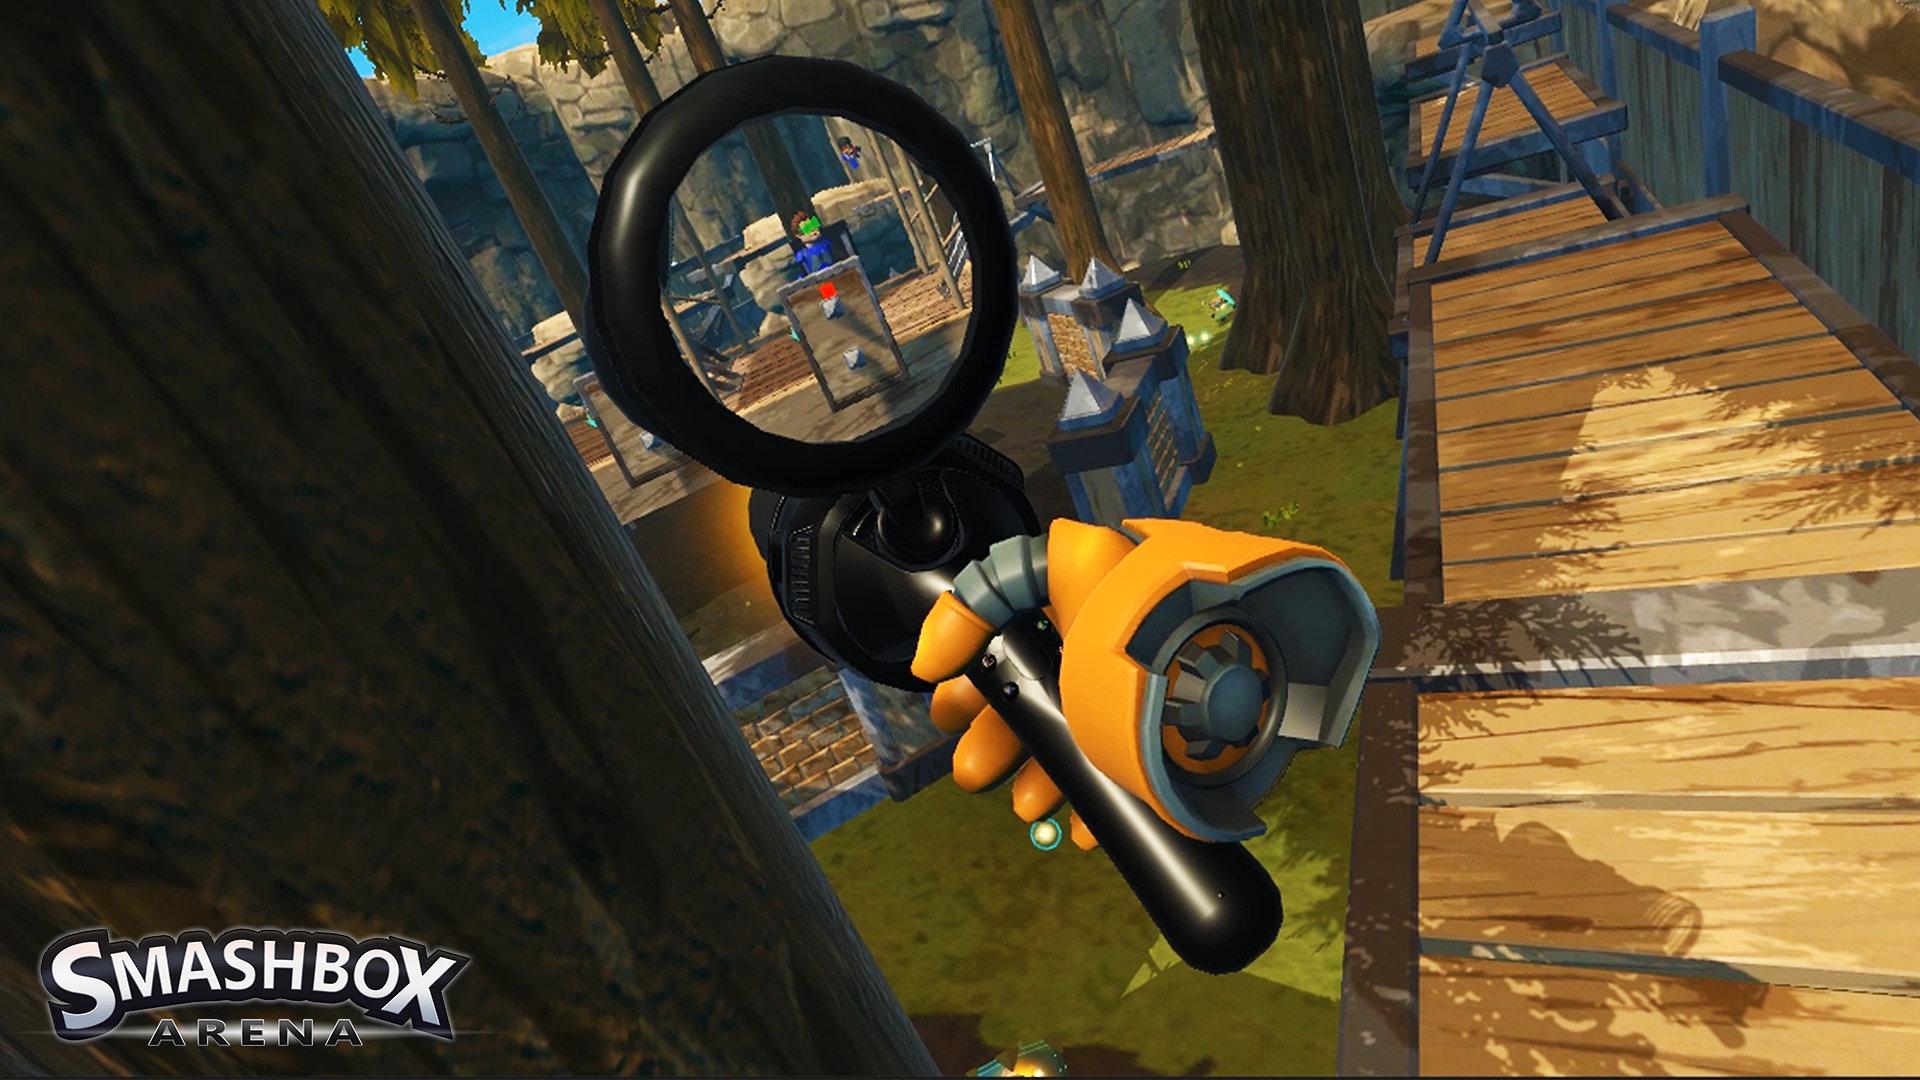 Smashbox Arena Game | PS4 - PlayStation